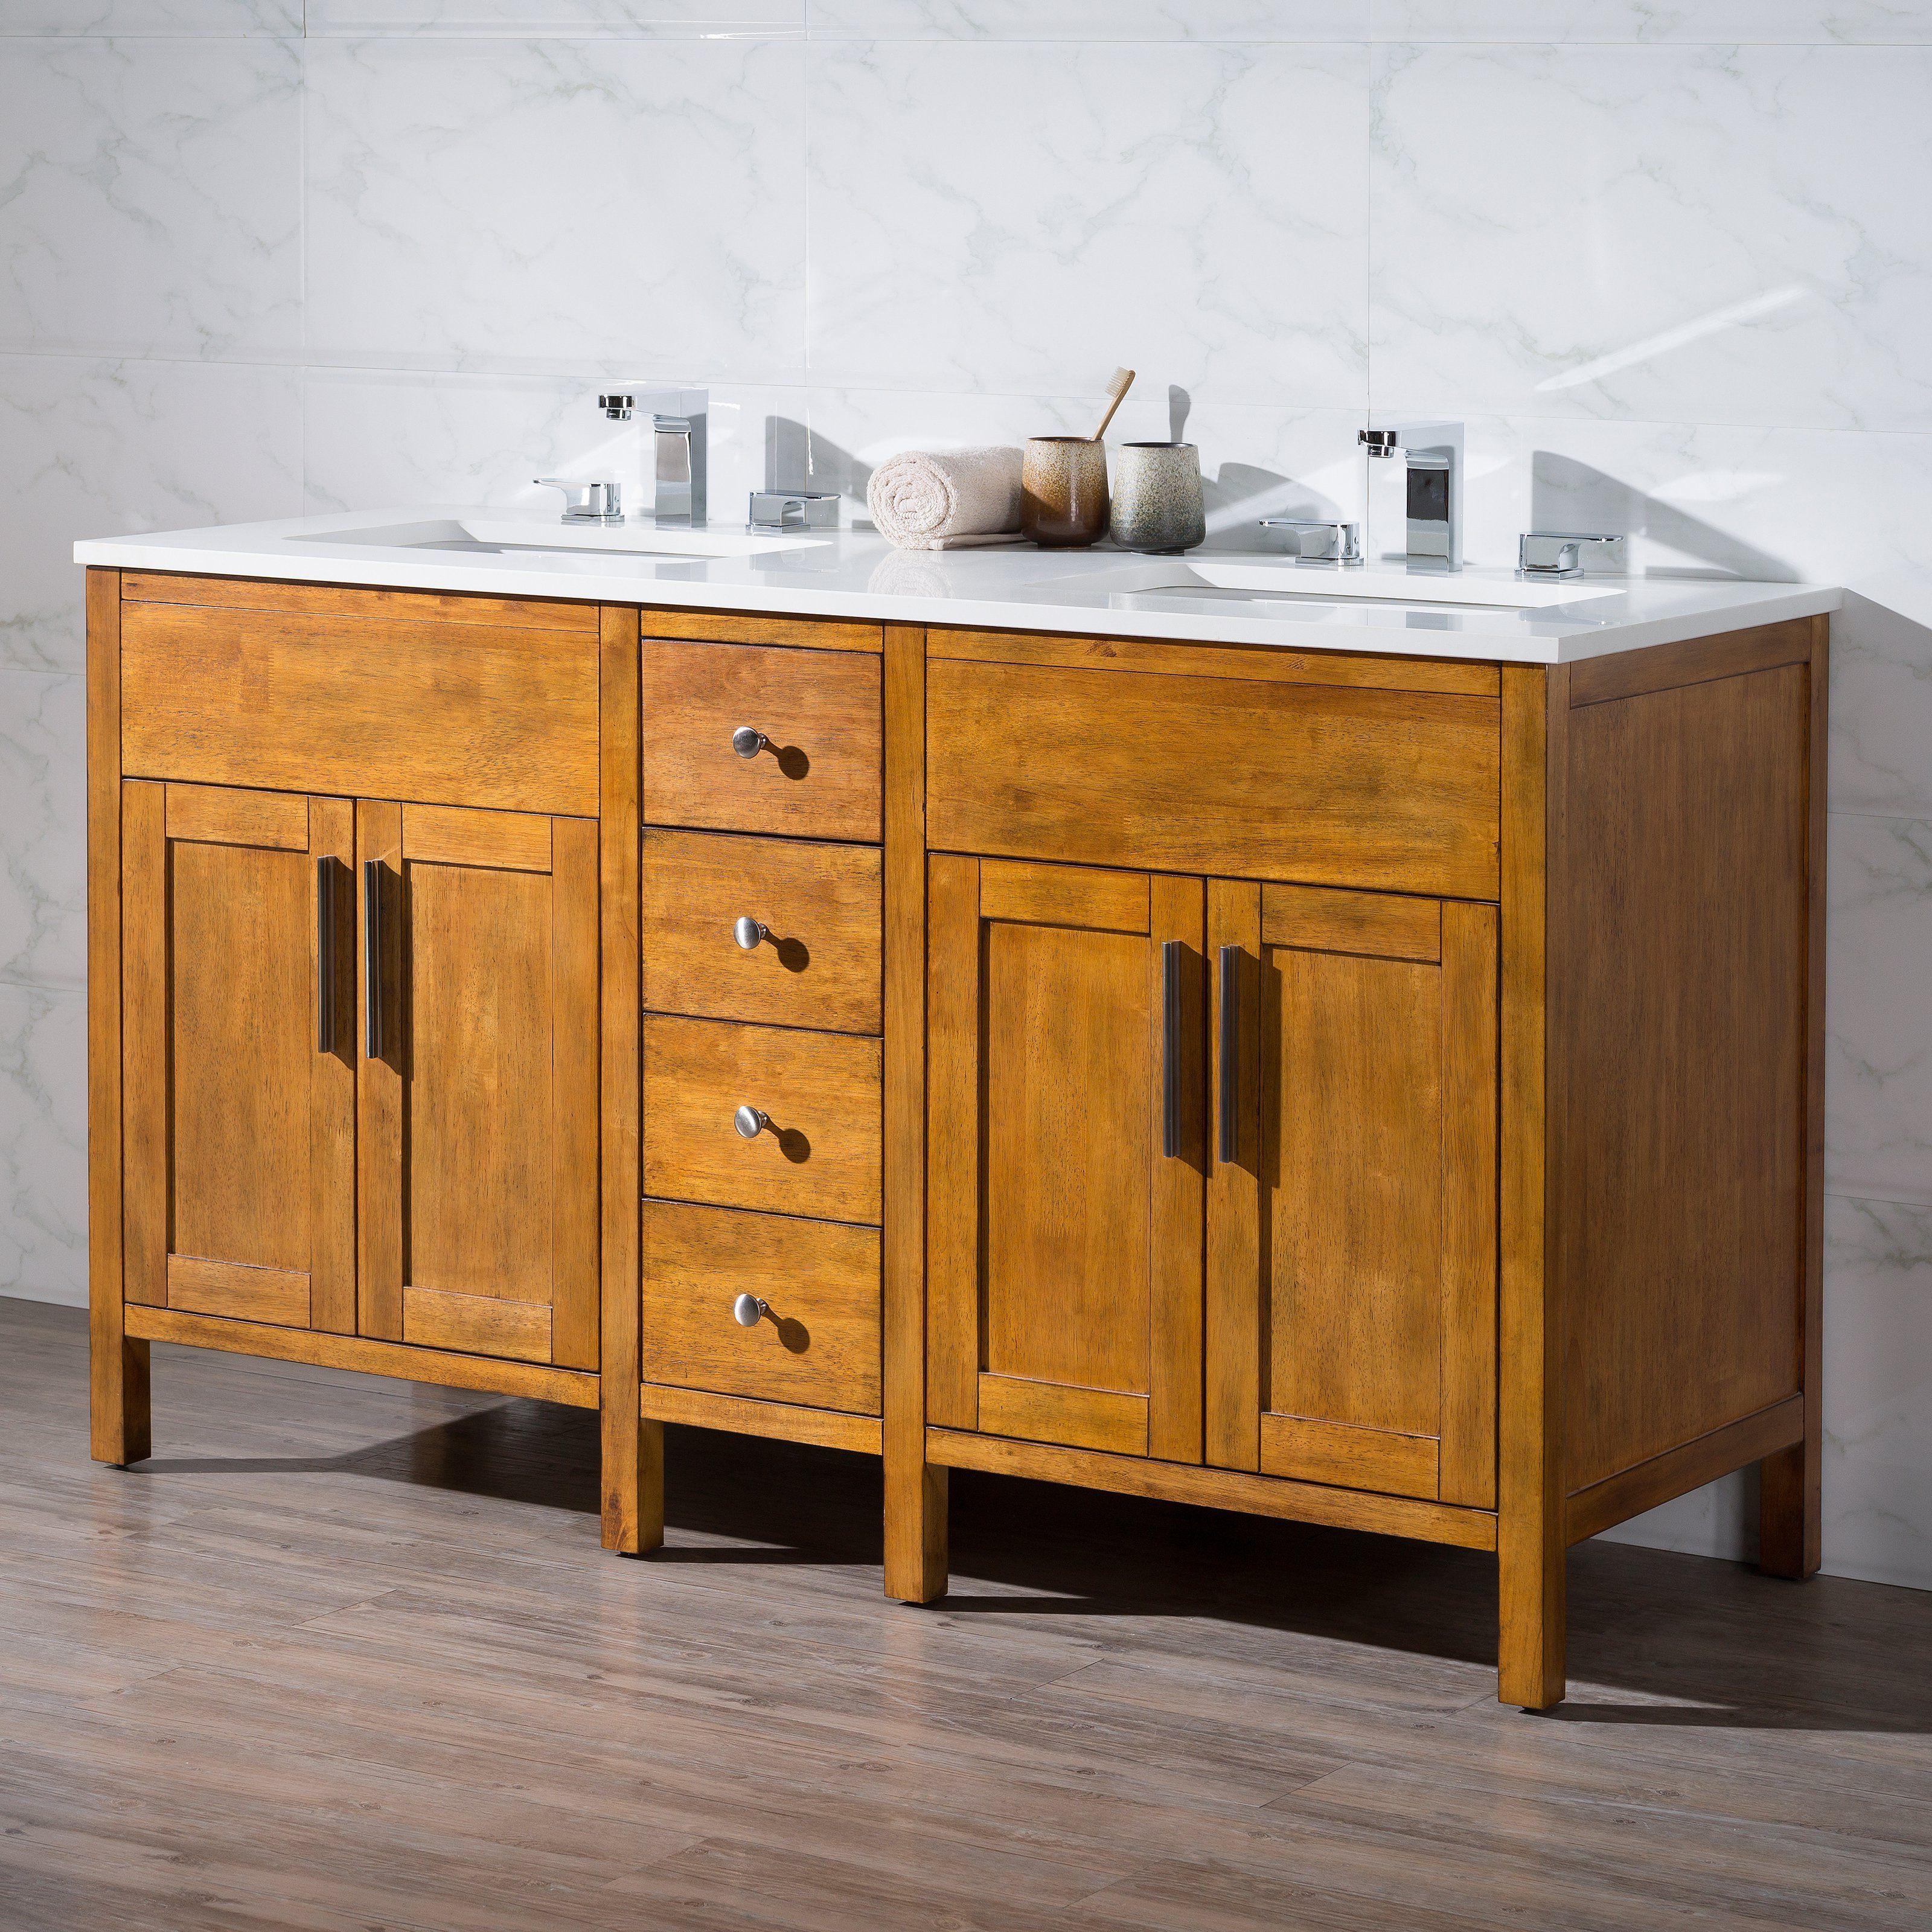 Stufurhome Evangeline 59 In Double Sink Bathroom Vanity Ty 6343